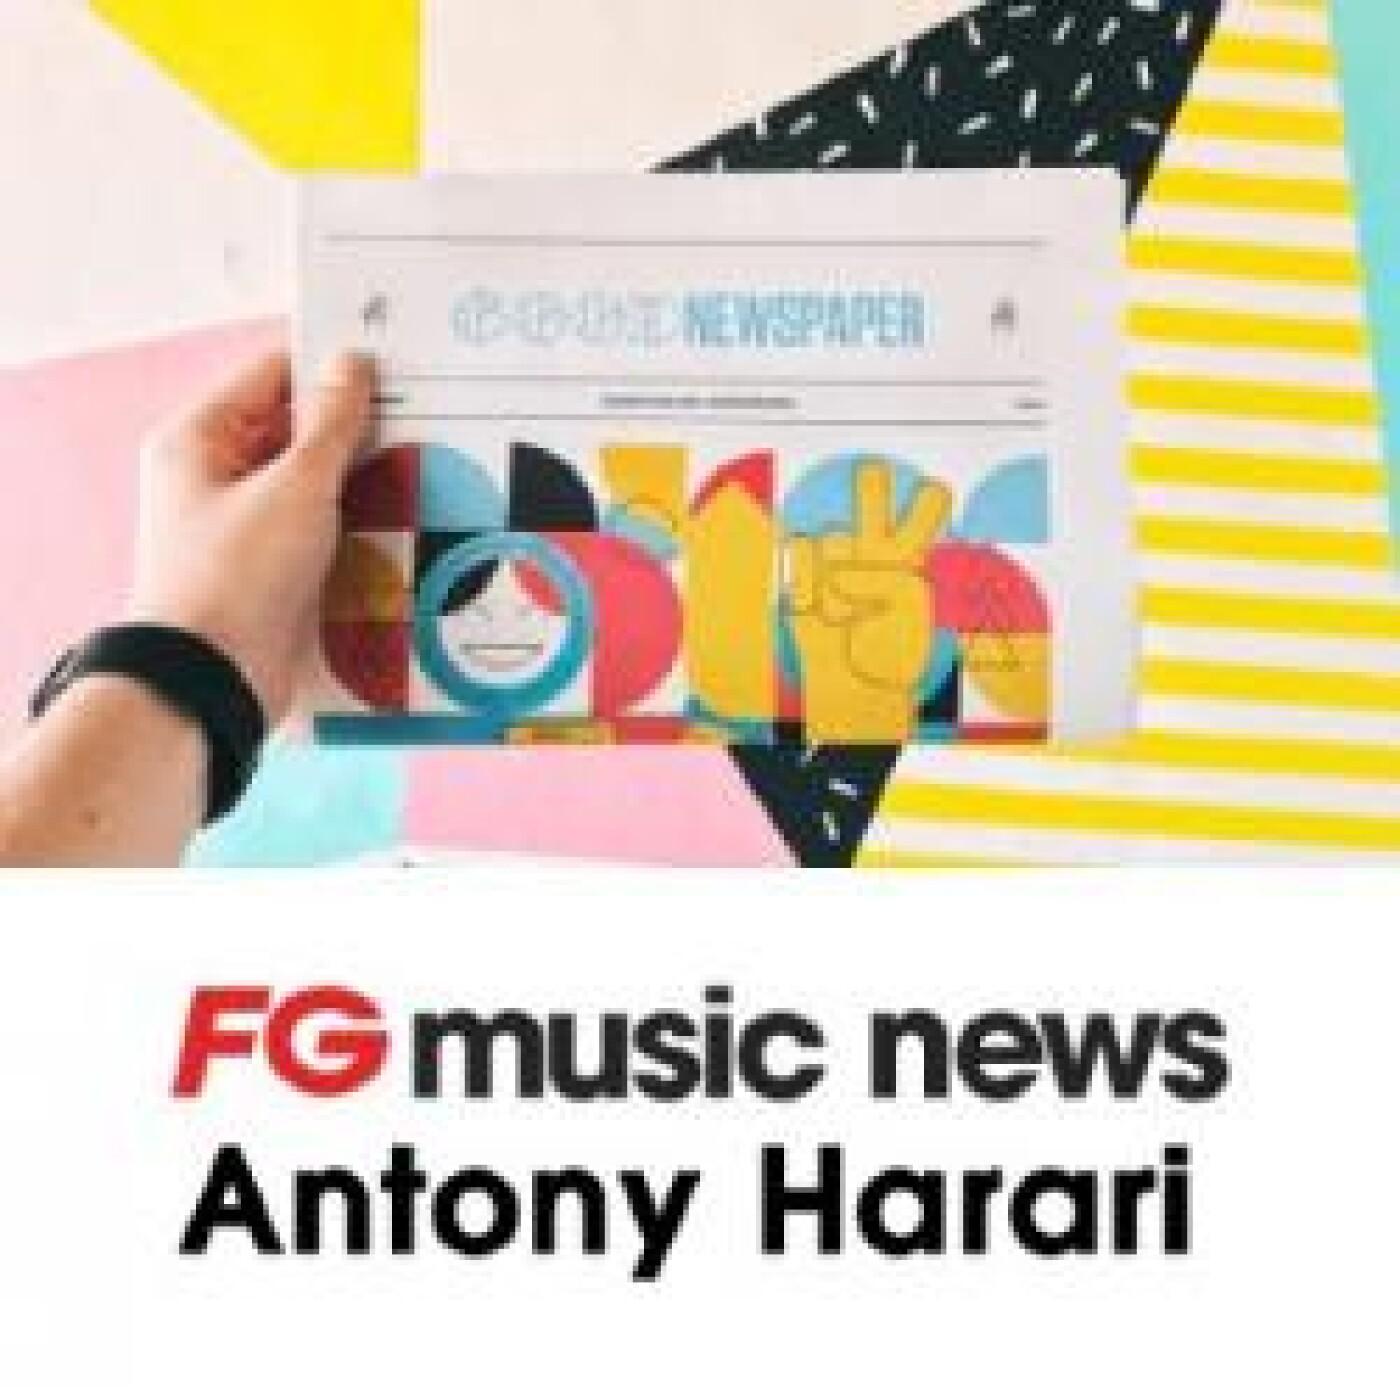 FG MUSIC NEWS : London Grammar remixé par Paul Woolford !